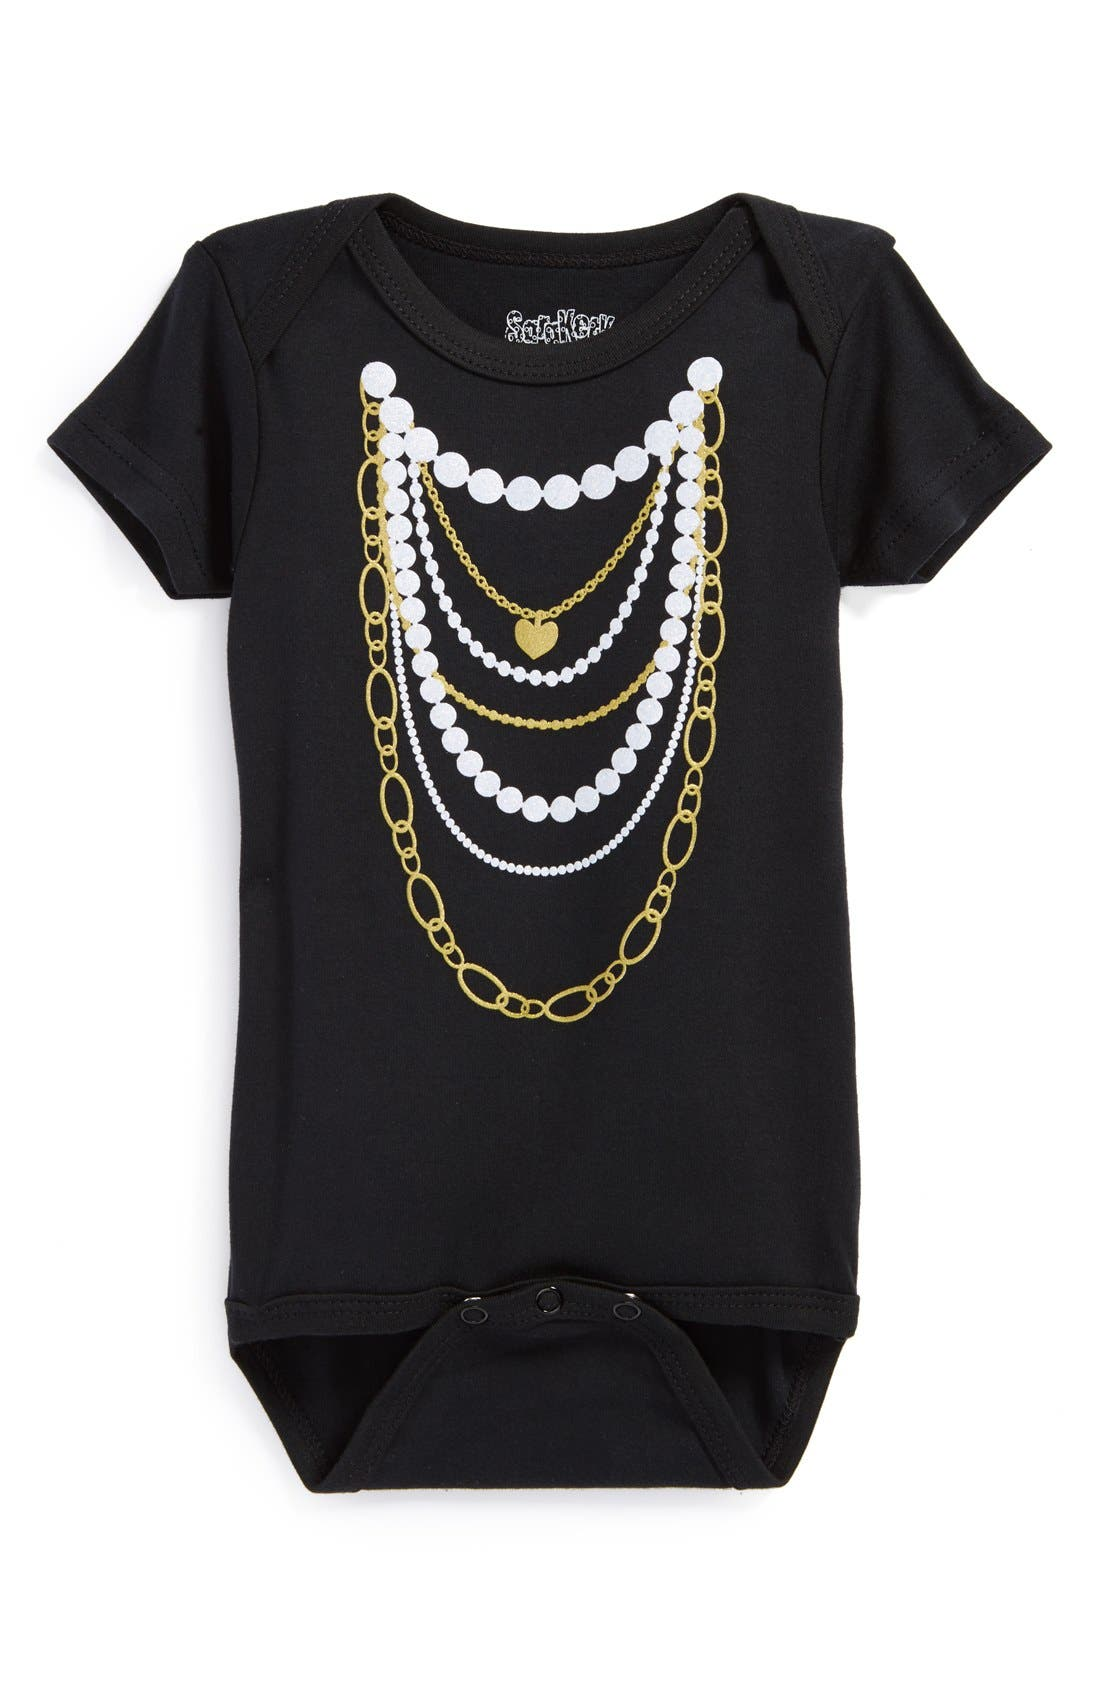 Main Image - Sara Kety Baby & Kids 'Gold 'n Pearls' Short Sleeve Bodysuit (Baby Girls)